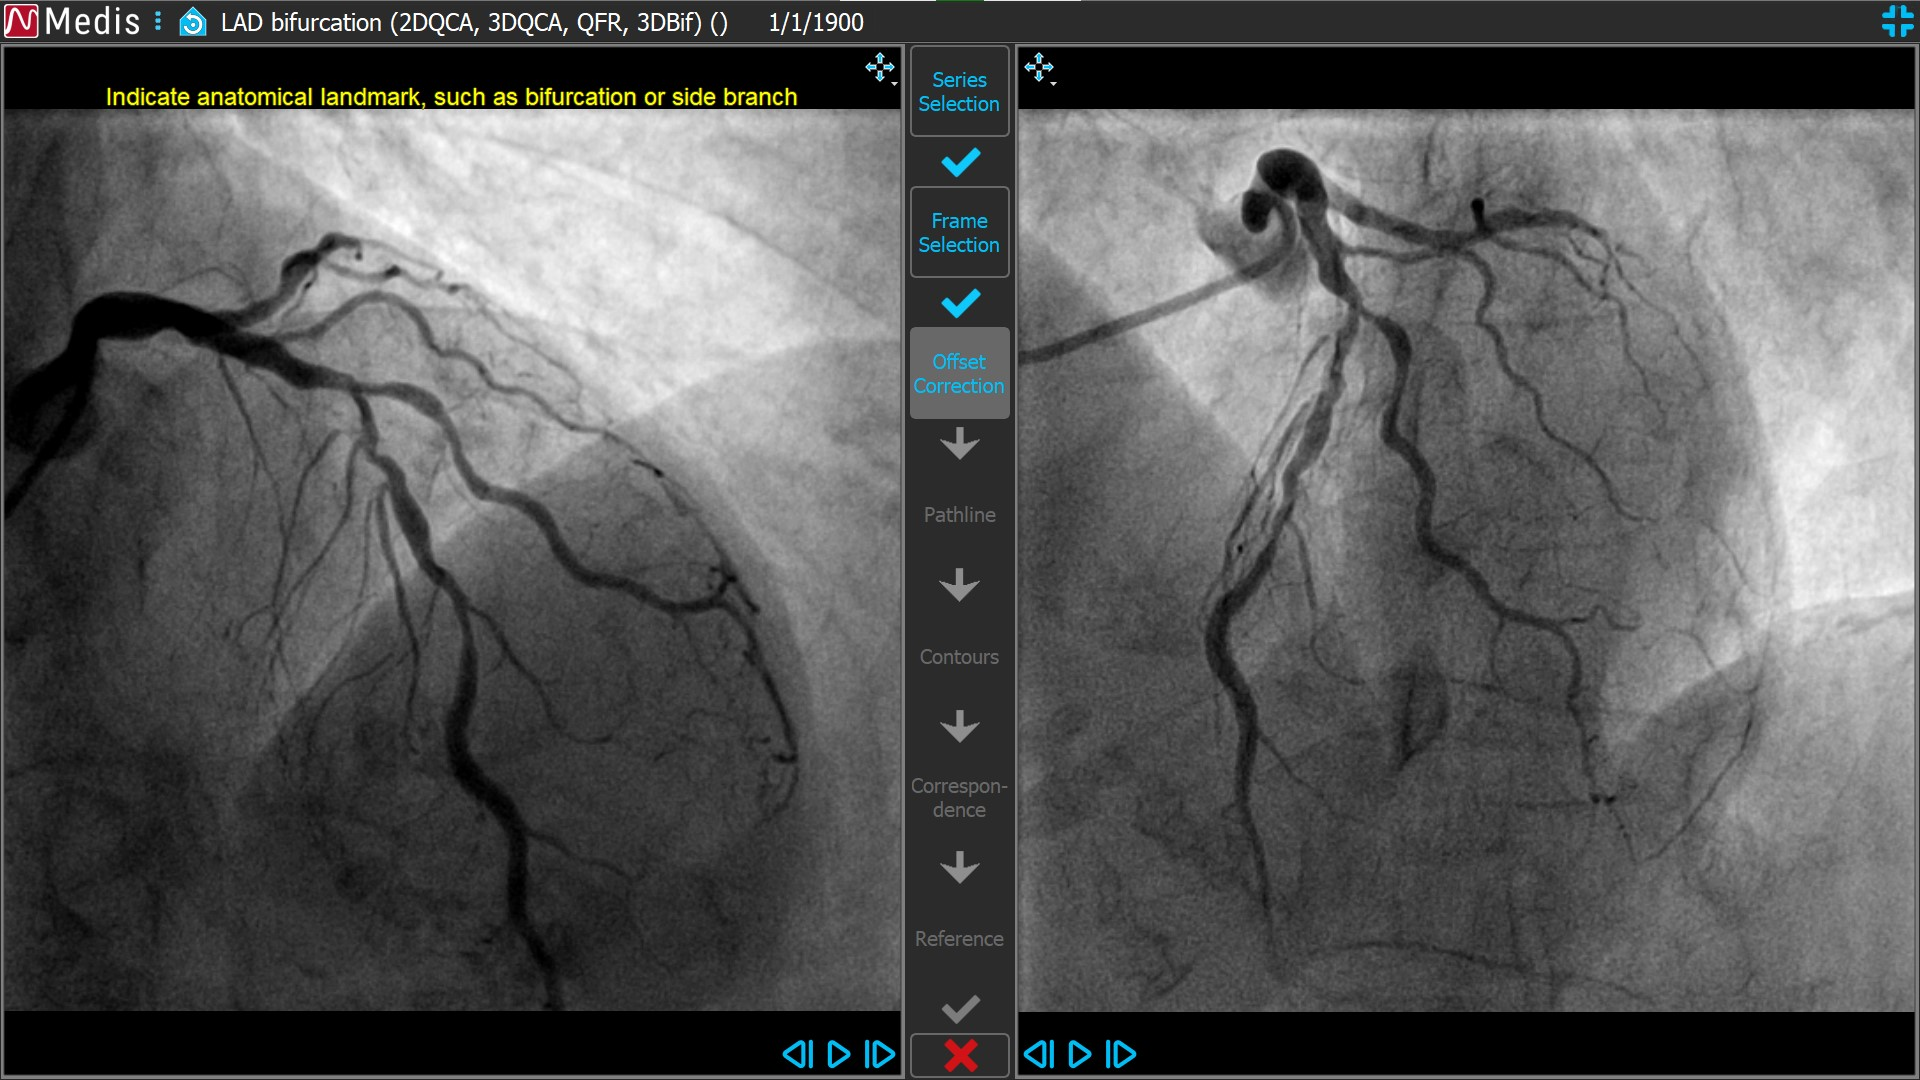 Medis Suite XA 3D QCA Bifurcation1 3 Offset Correction